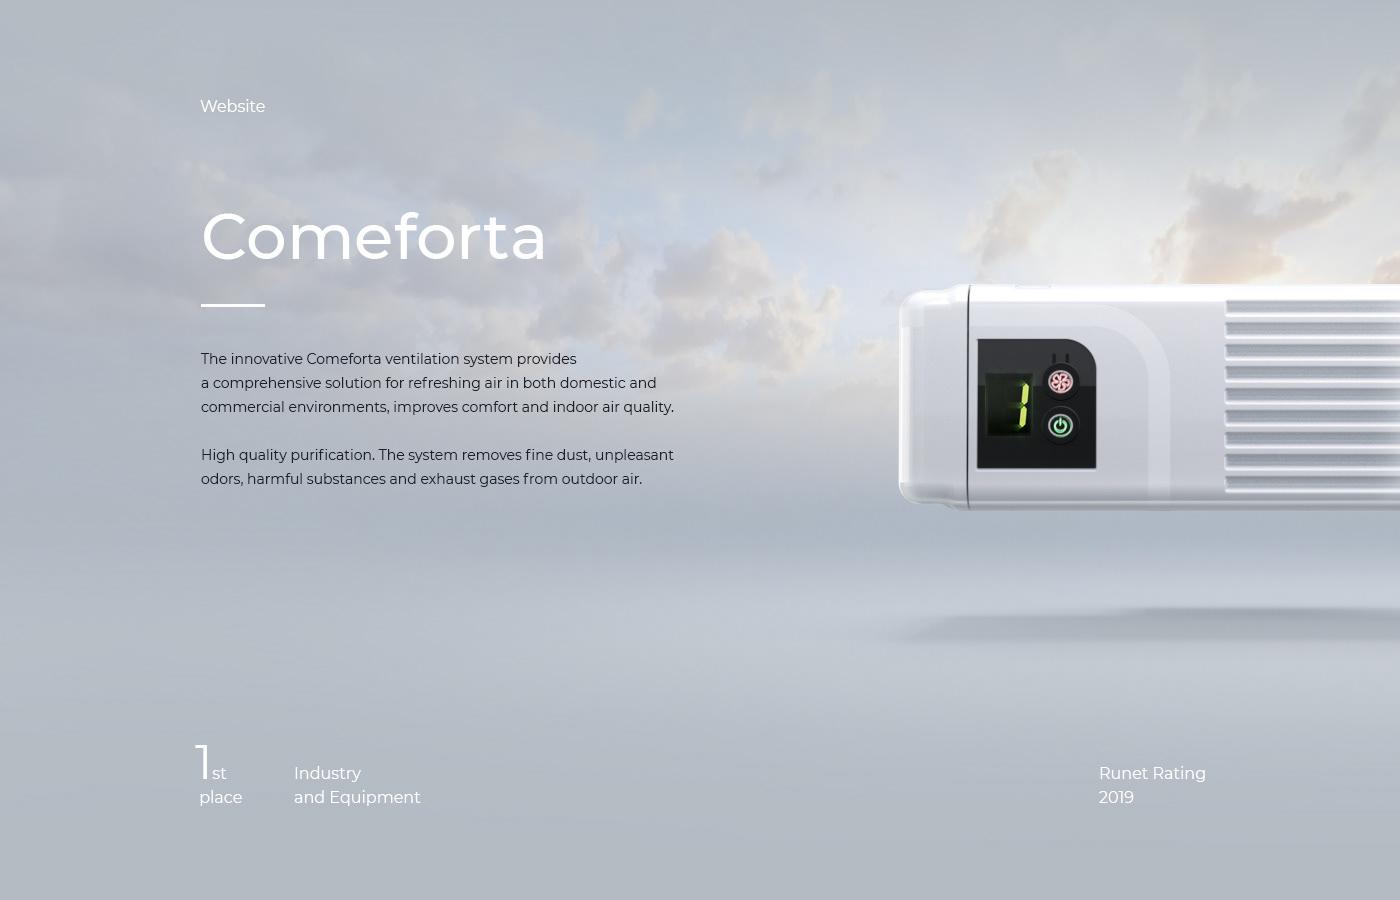 techart comeforta Website 1 place Runet Rating 2019